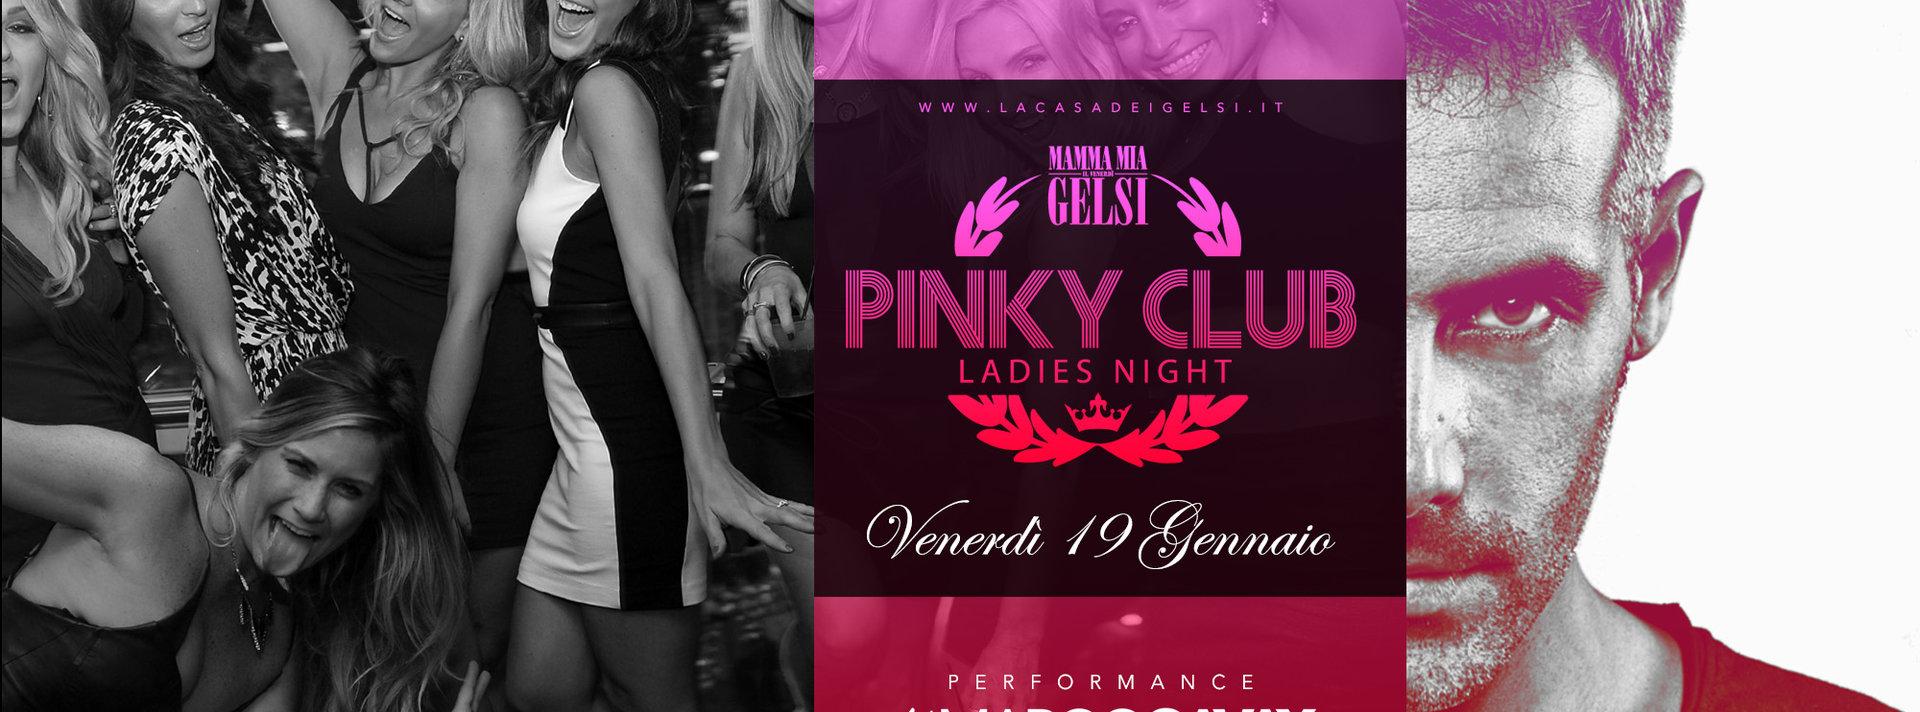 Pinky Club con Cavax - 19 gennaio 2018